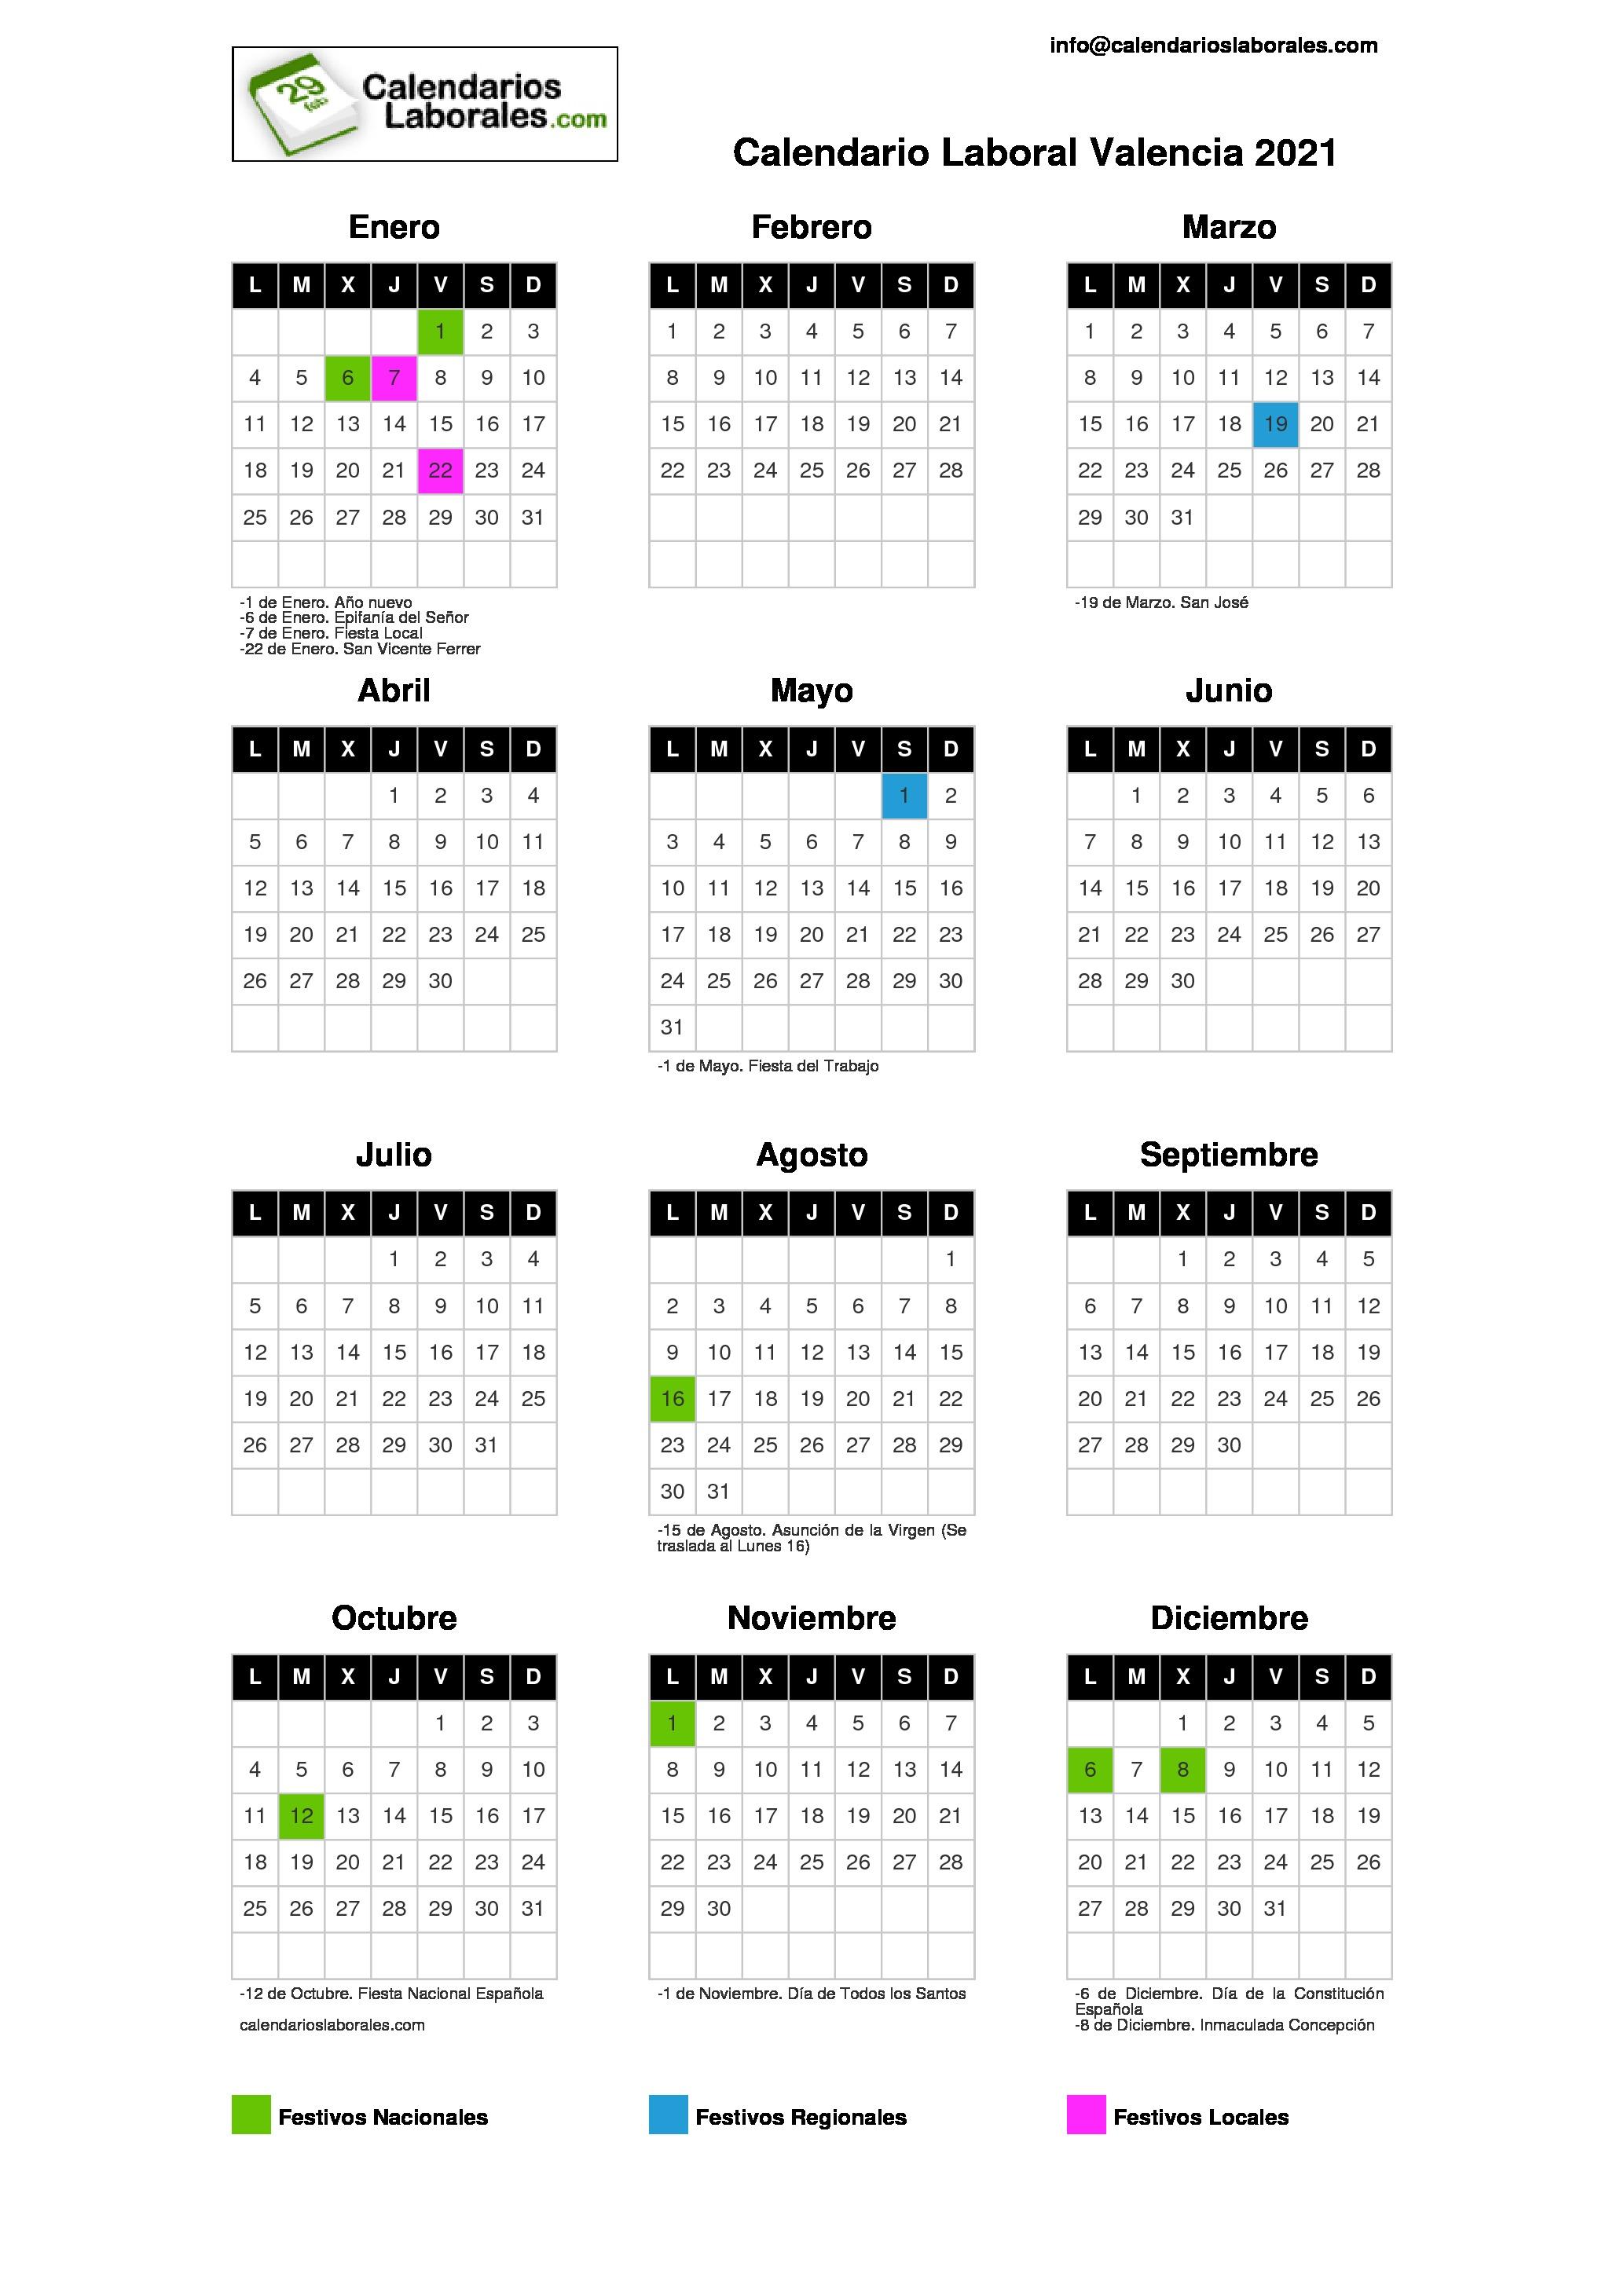 Calendario Laboral Elche.Calendario Laboral Valencia 2021